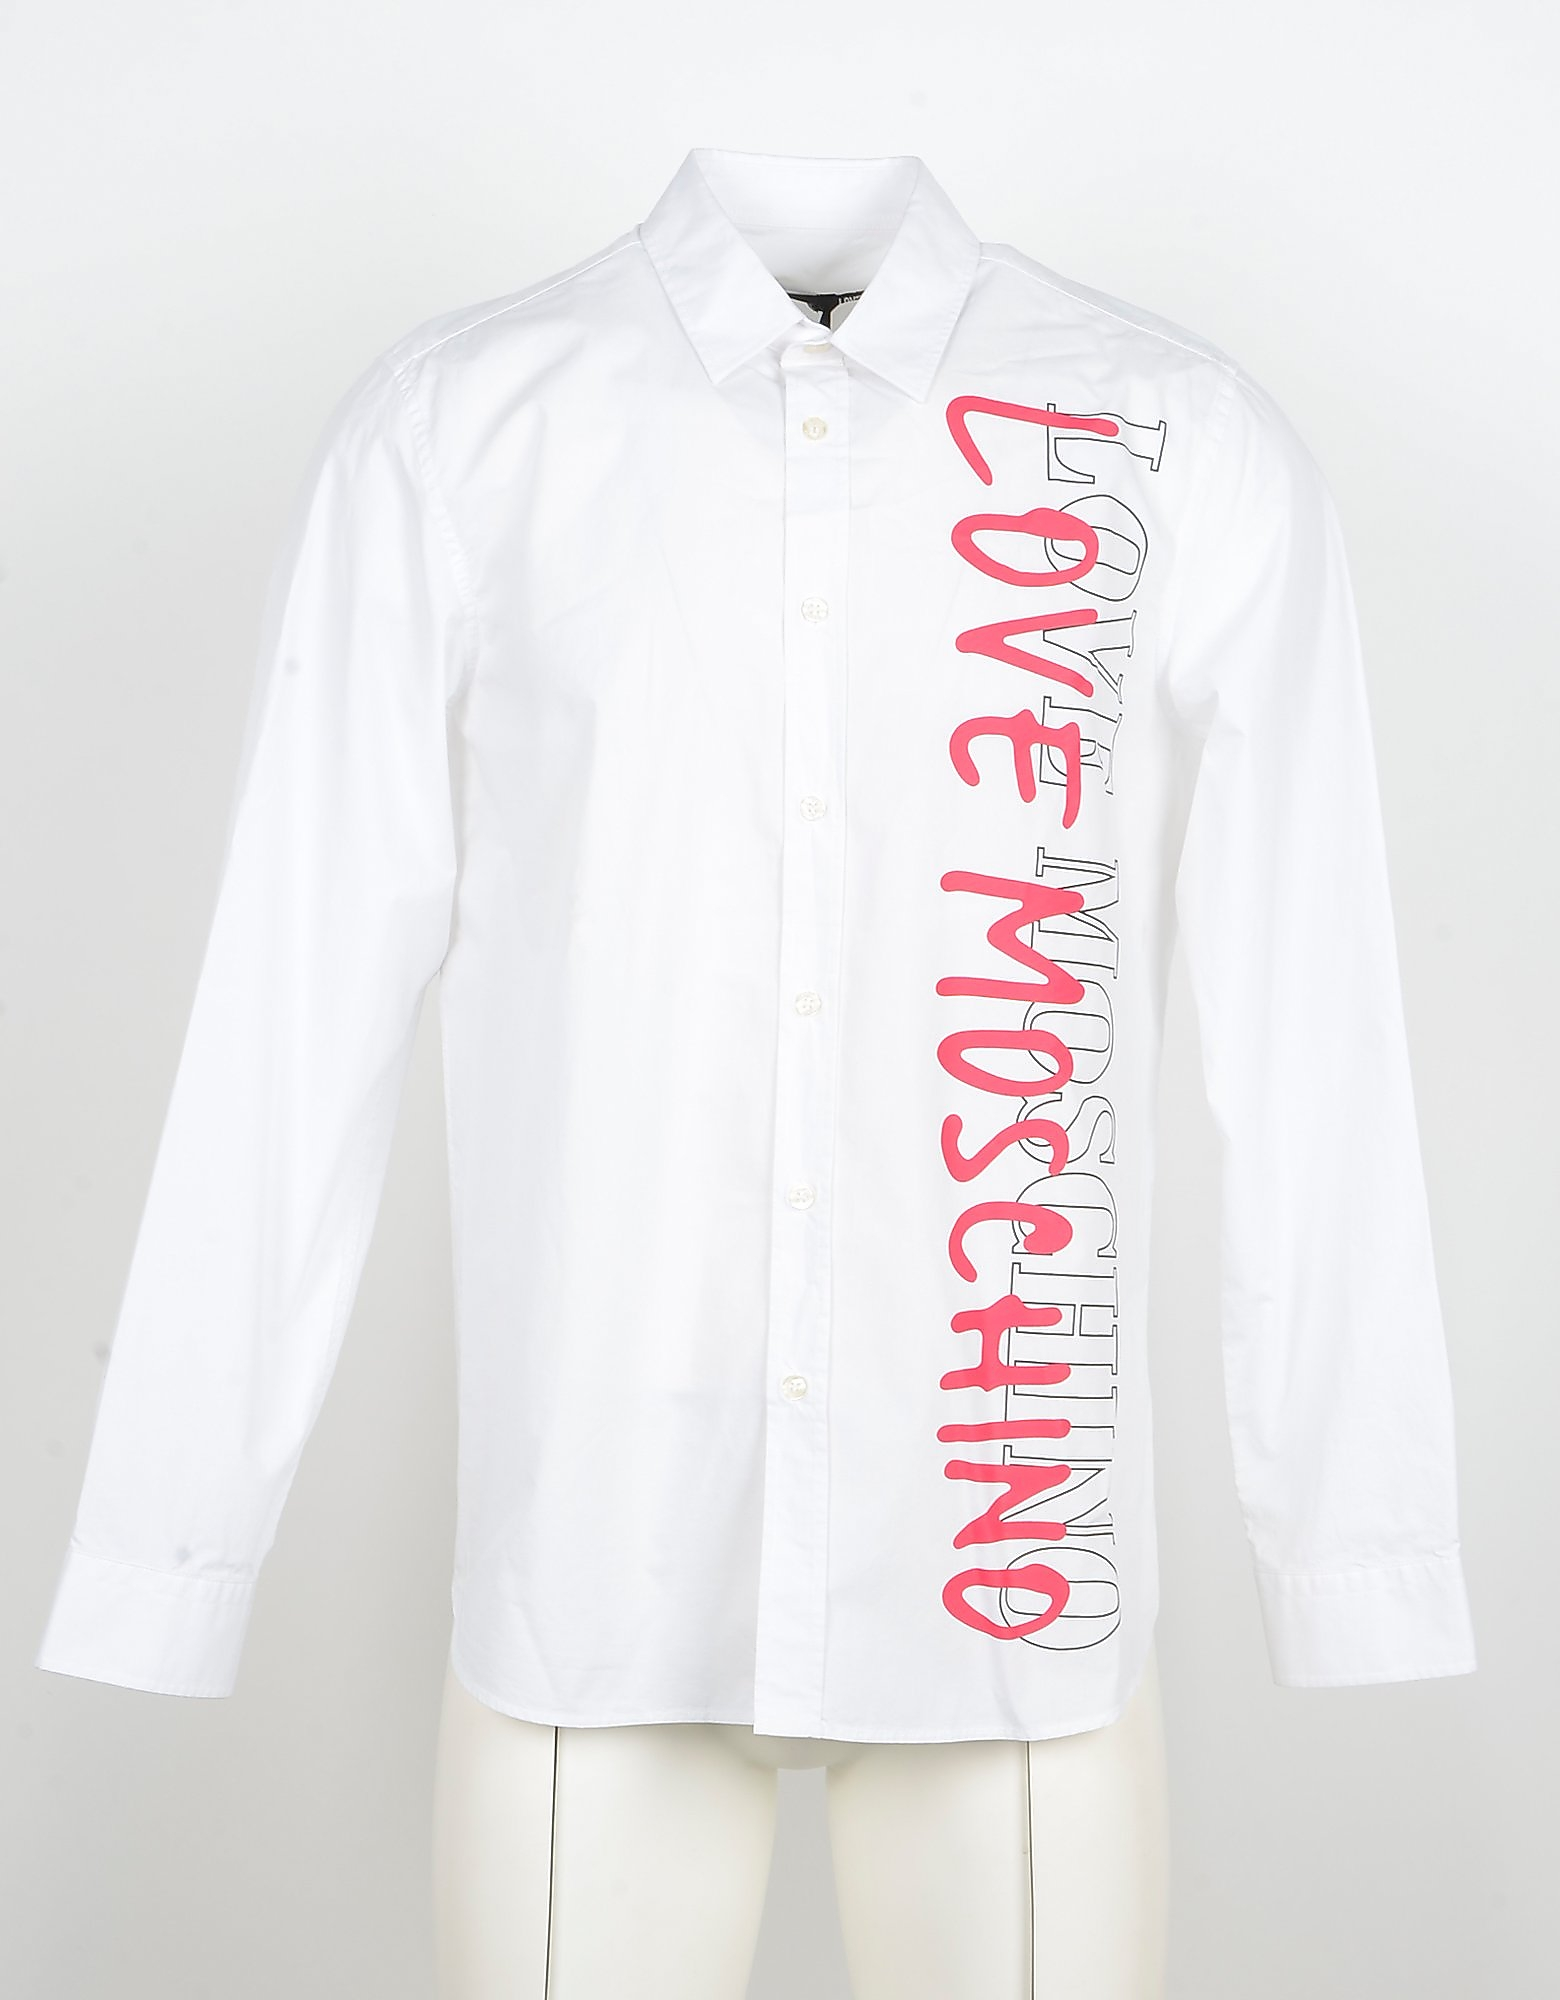 Love Moschino Designer Shirts, Signature Print White Cotton Men's Shirt w/Long Sleeve